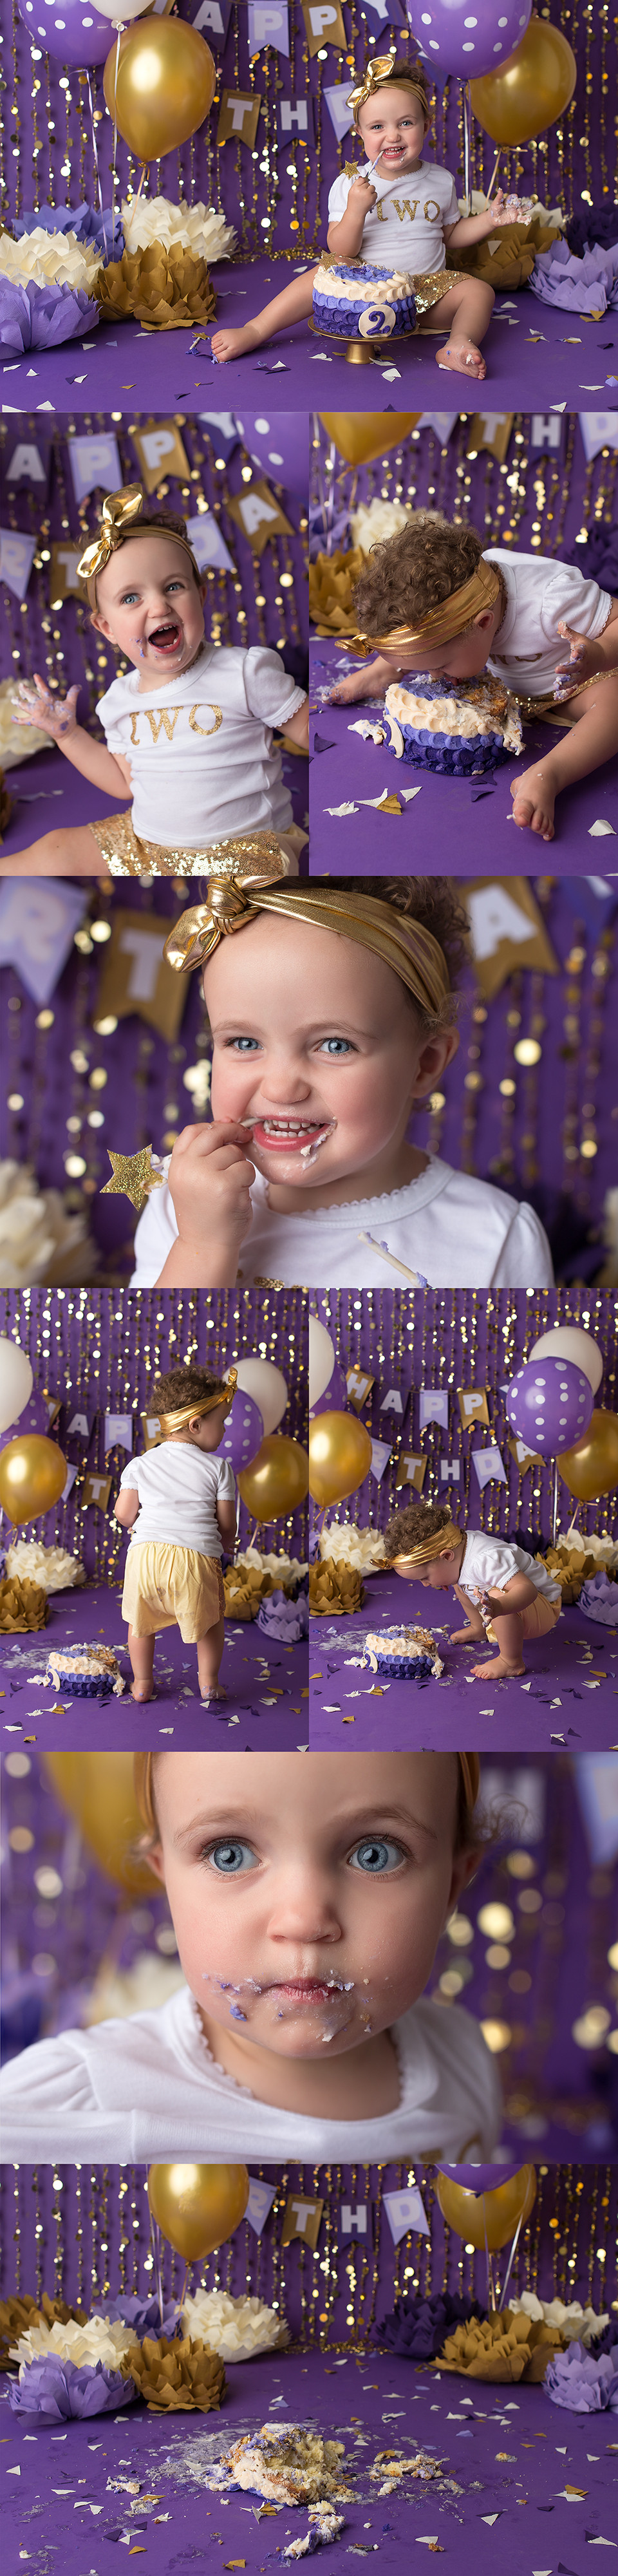 SCARLETT IS TWO! BIRTHDAY PHOTO SESSION | HAMILTON, ON CHILDREN'S PHOTOGRAPHER